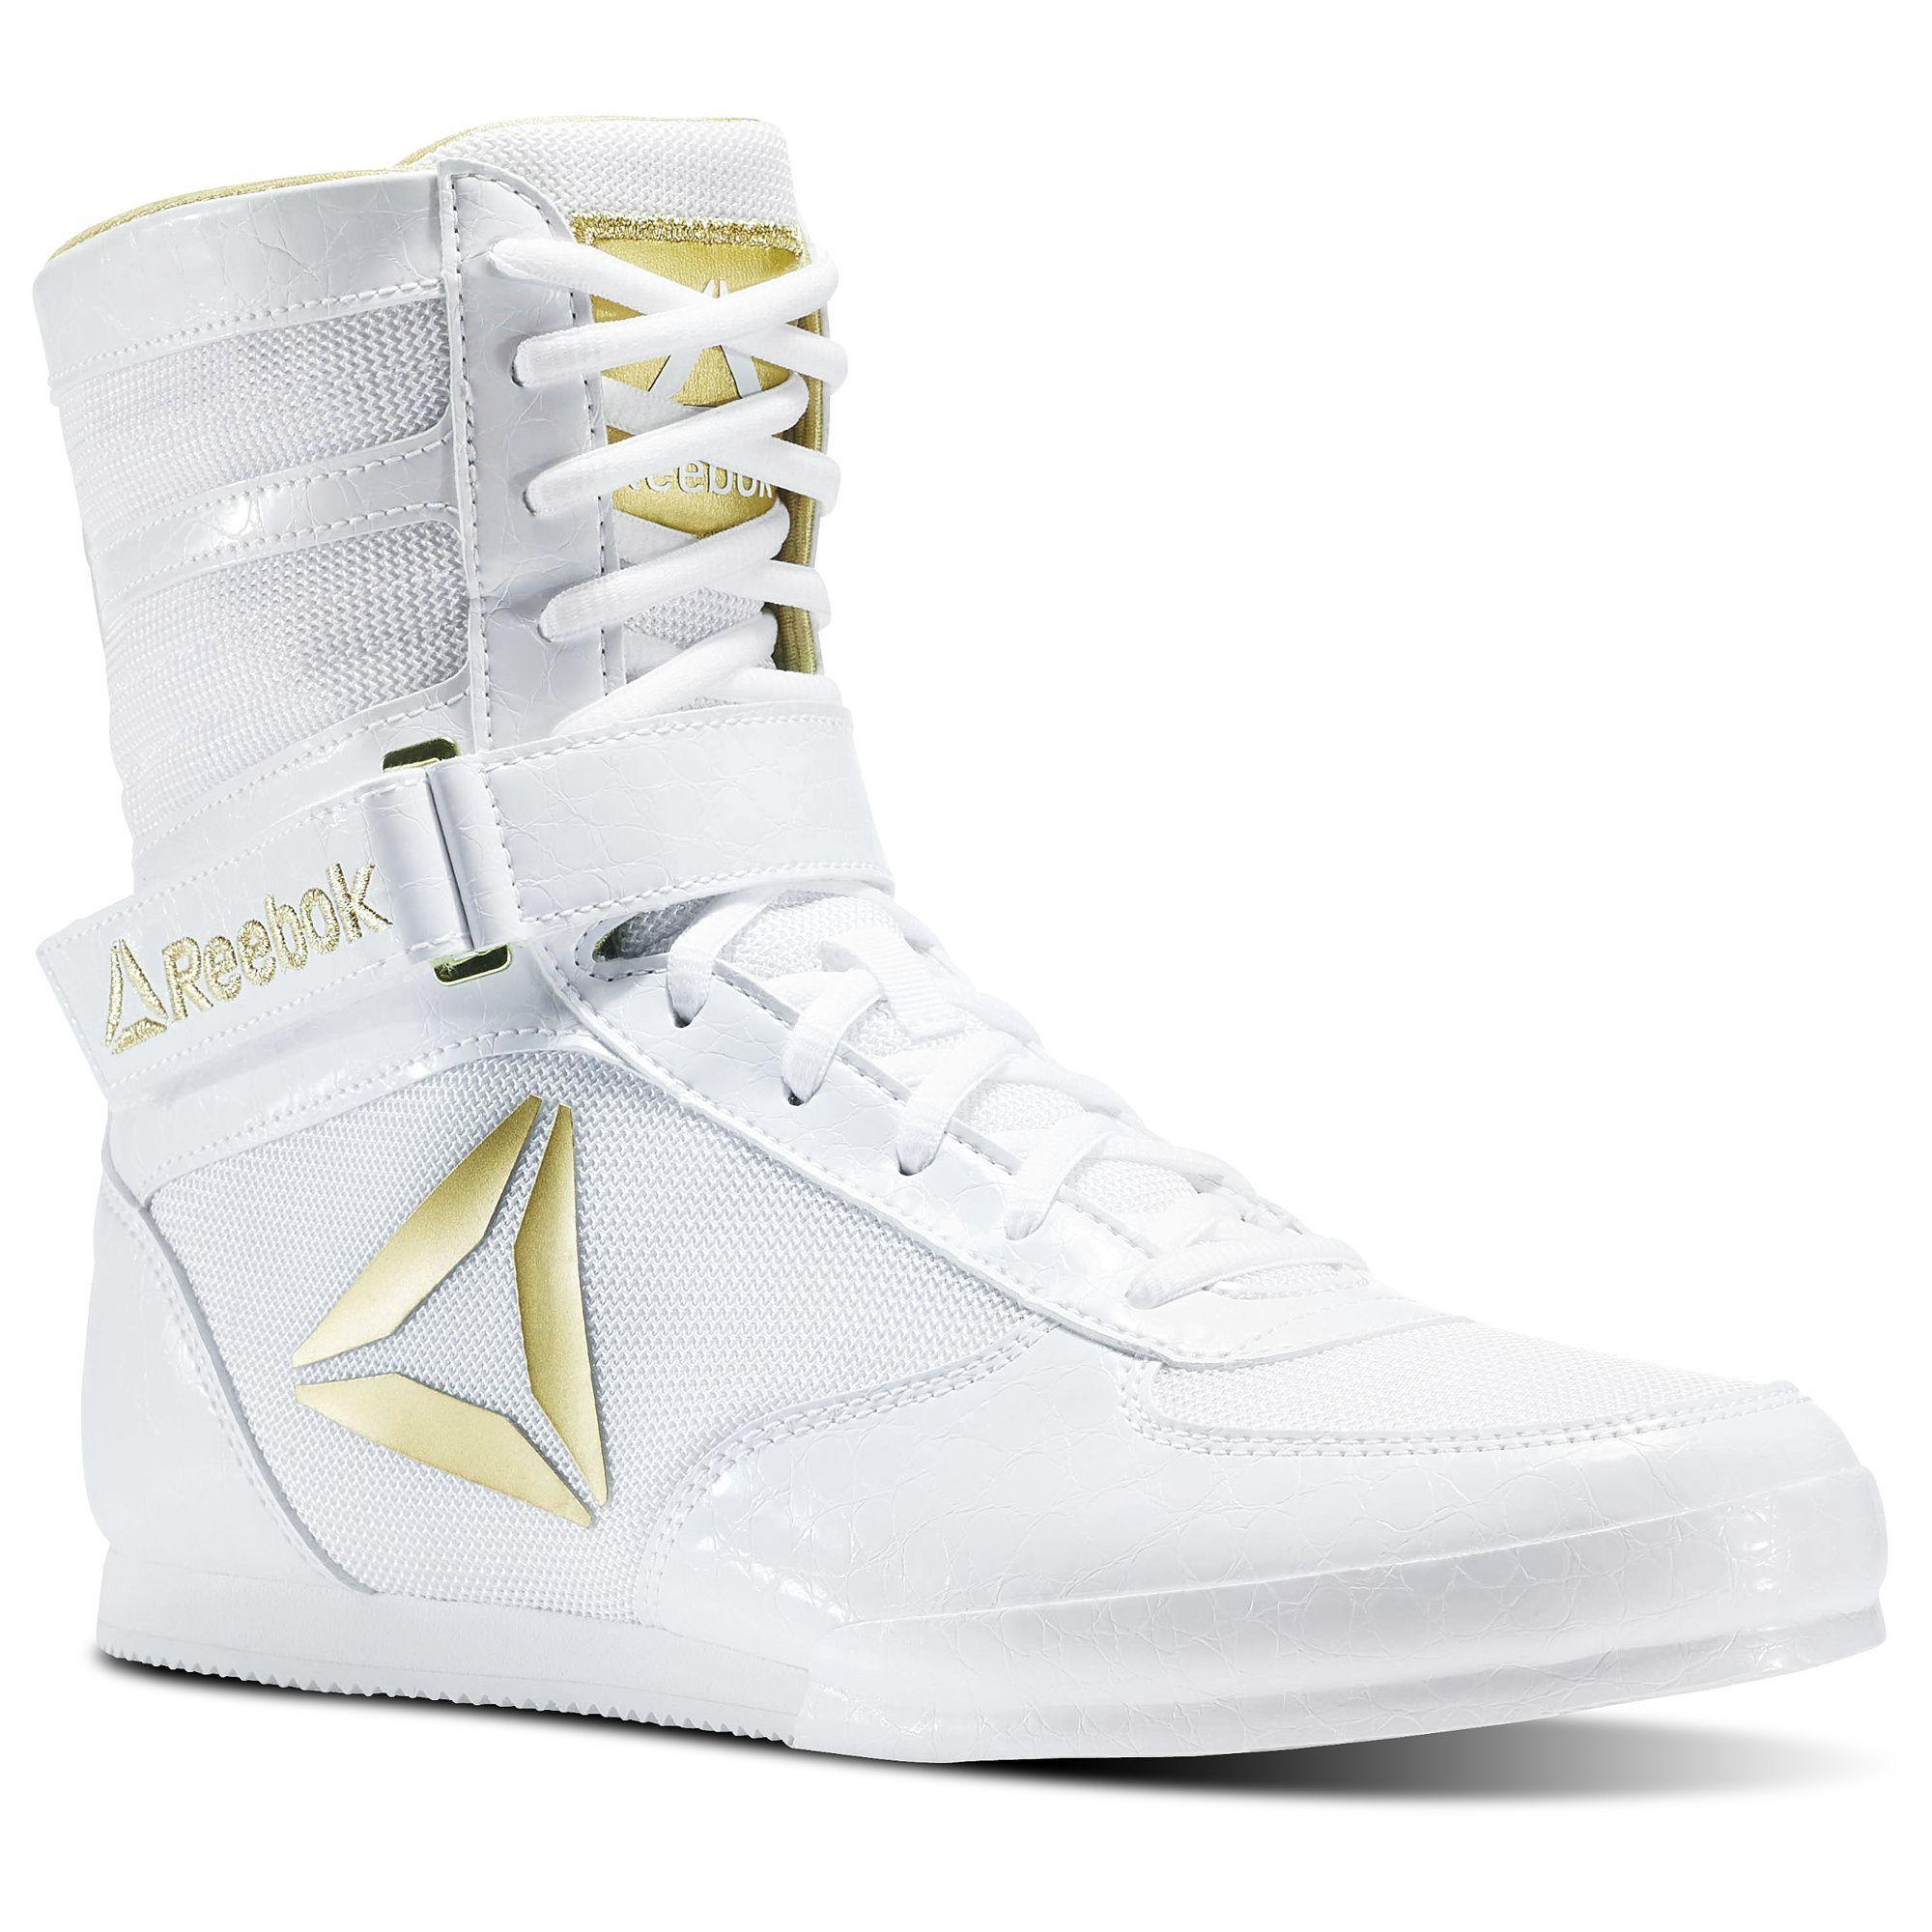 Obediencia helicóptero eficientemente  Reebok Boxing Boot - Buck White / Gold 7.5 | Zapatos jordan para chicas, Boxeo  mujer, Guantes de boxeo